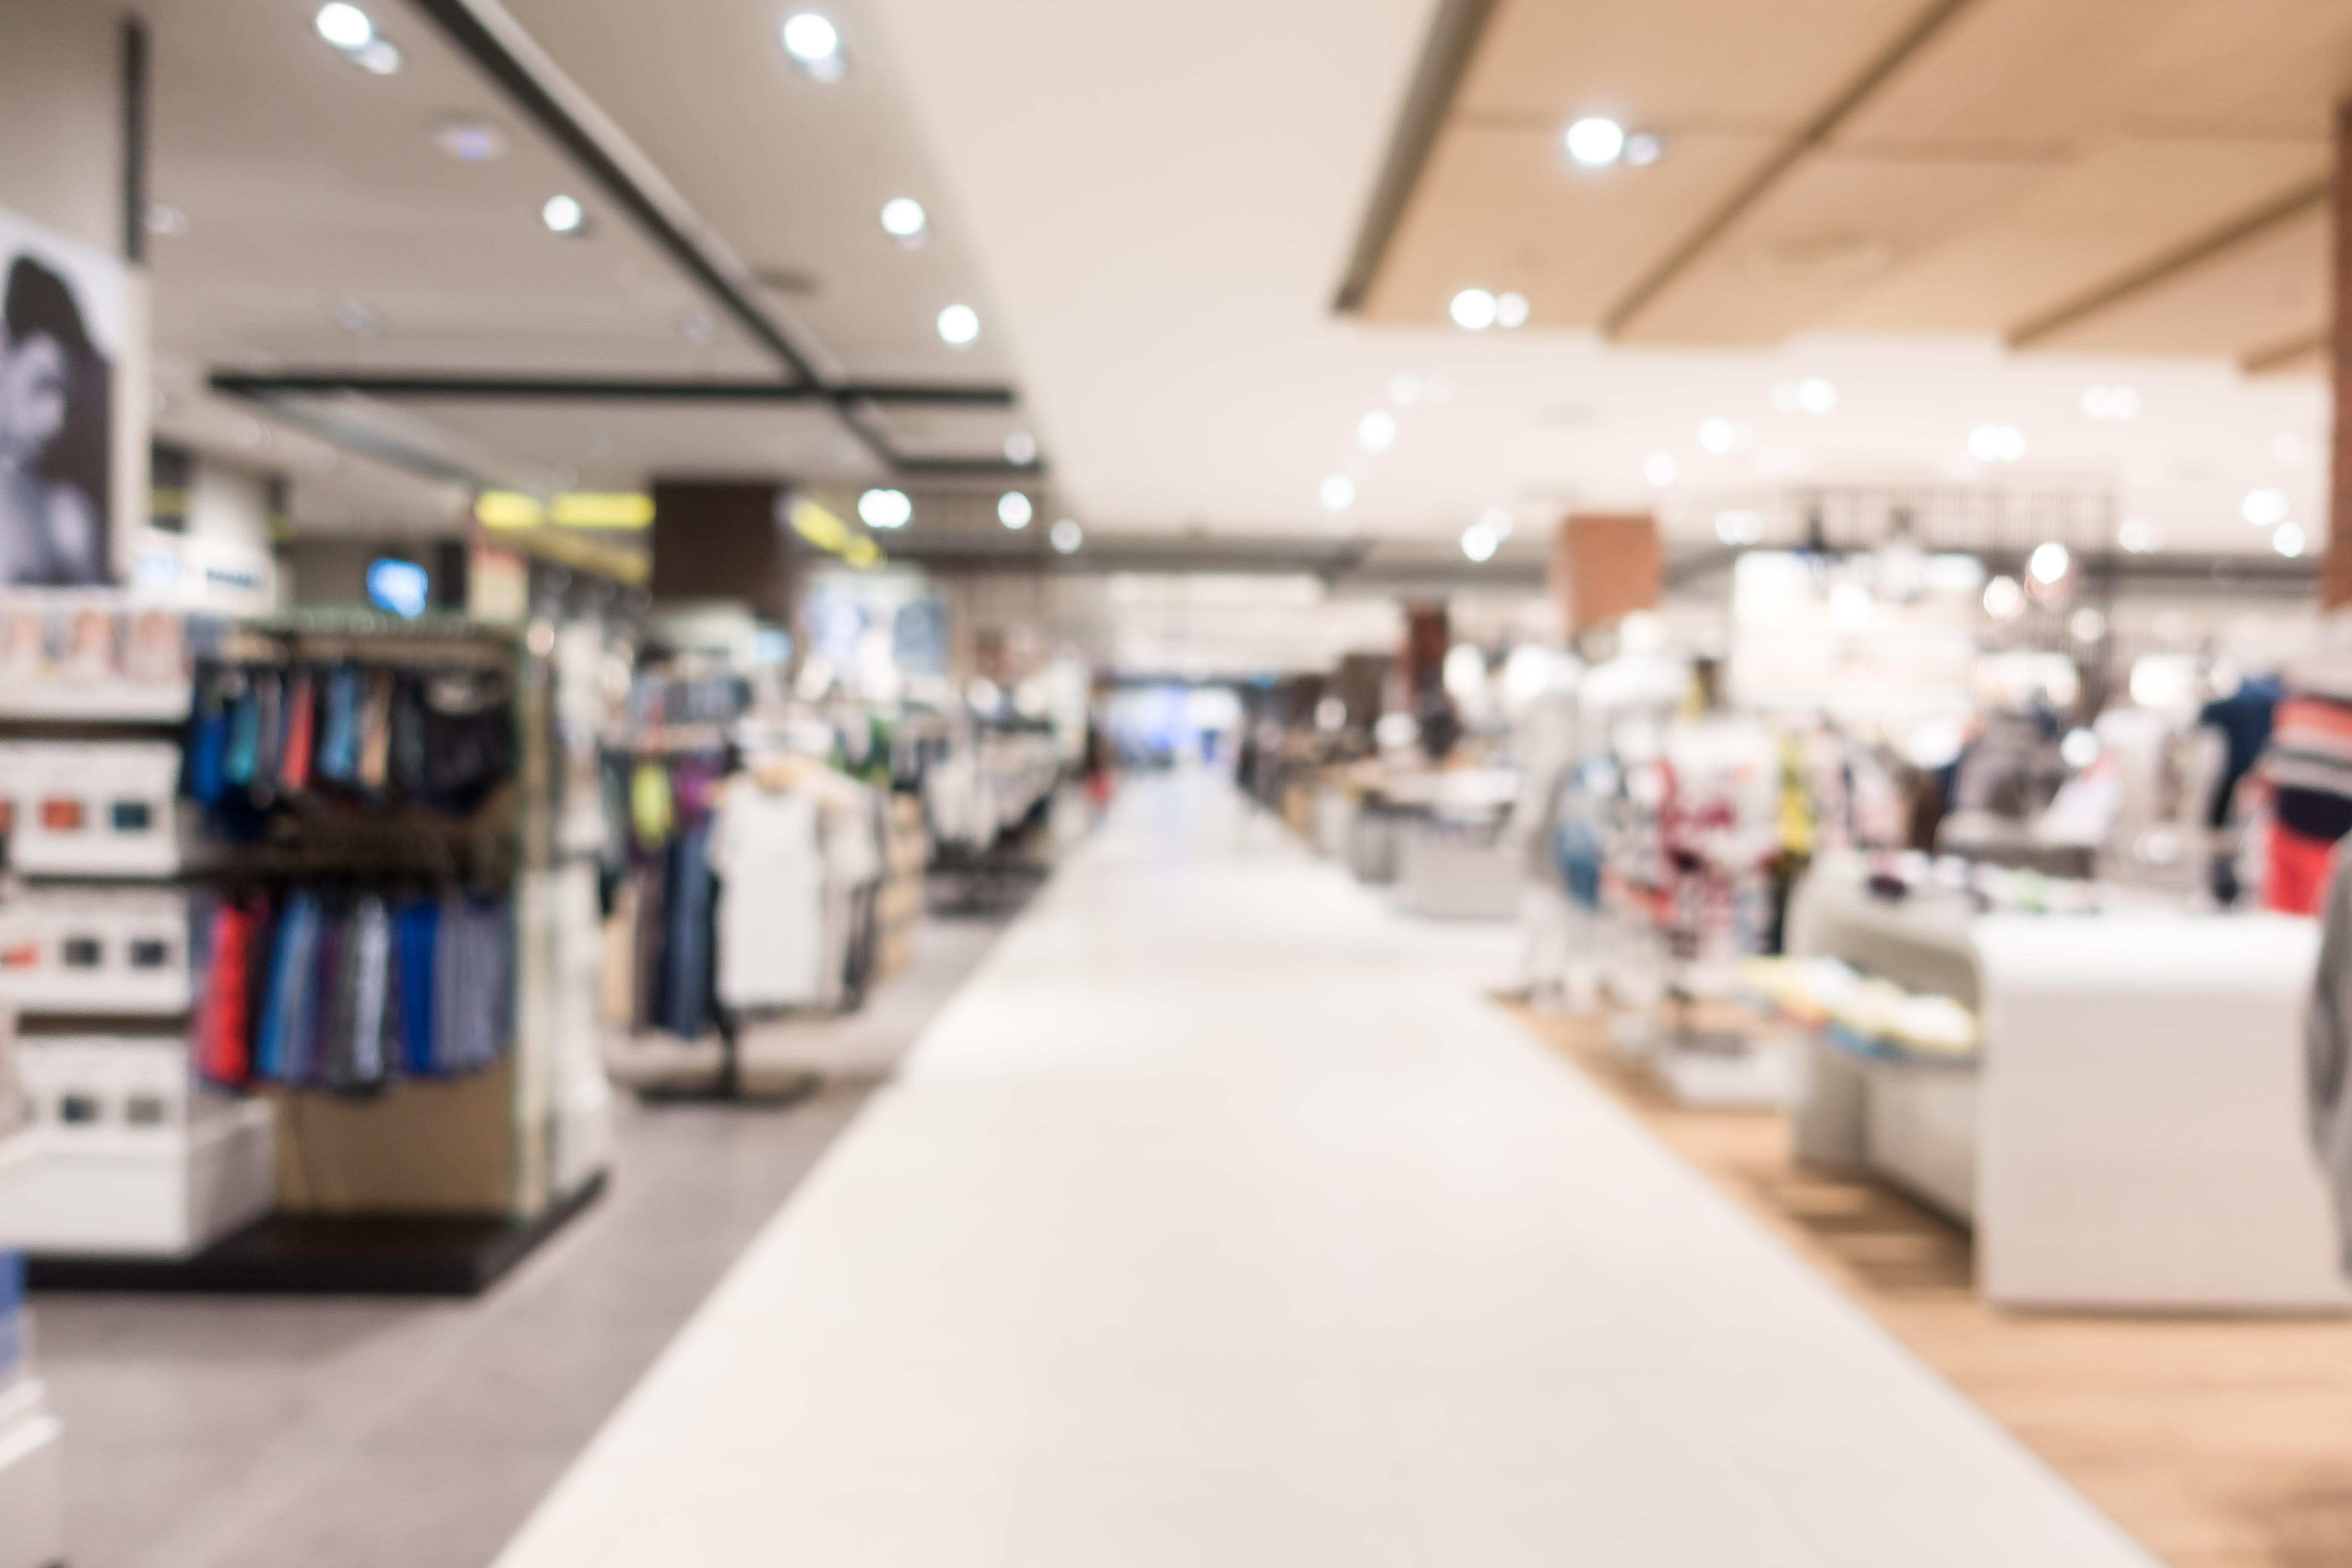 abstract-blur-shopping-mall-min